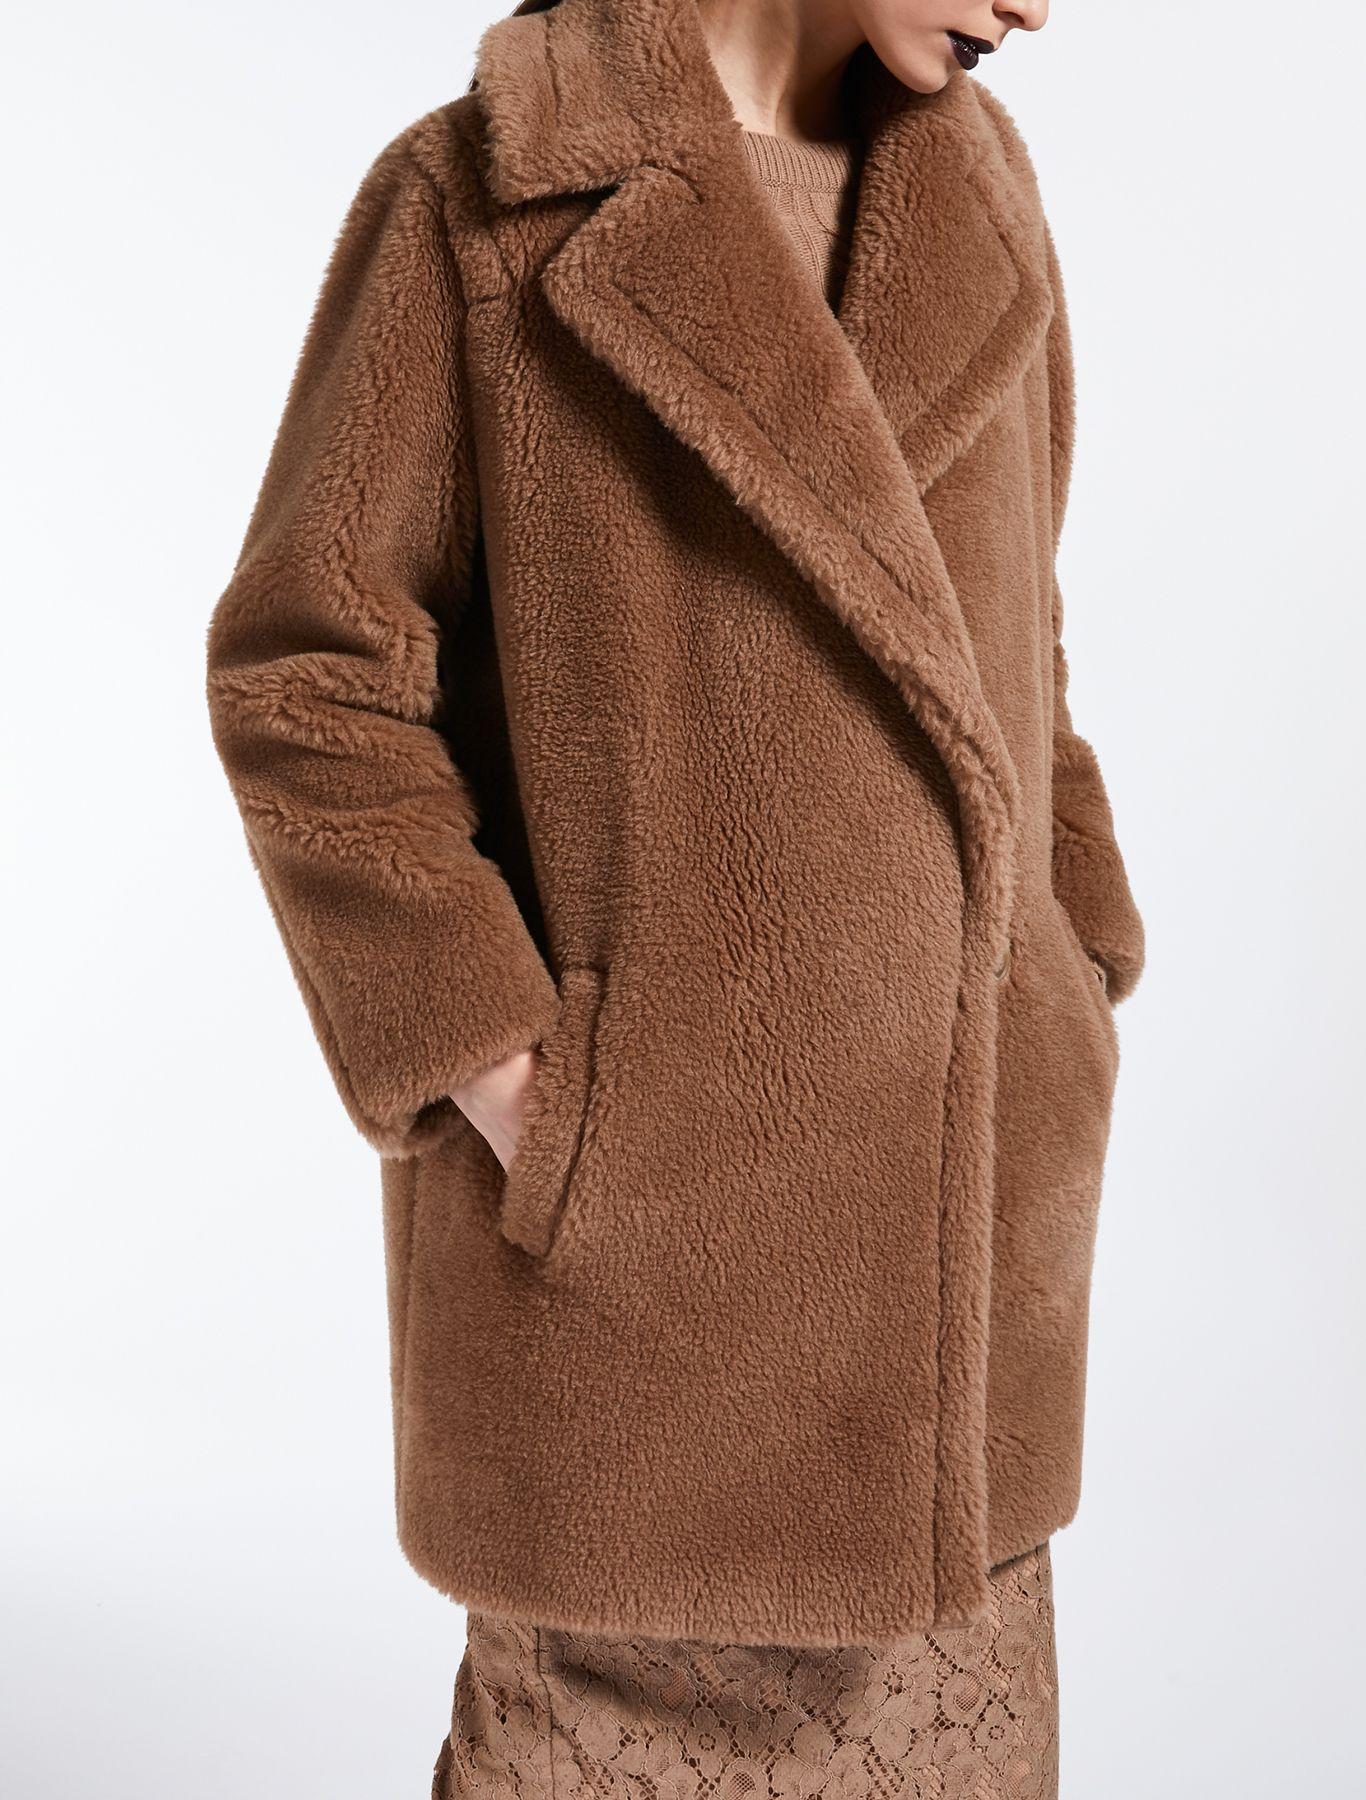 Veste en Fourrure Femme Parka Hiver Manteau Zara Cardigan